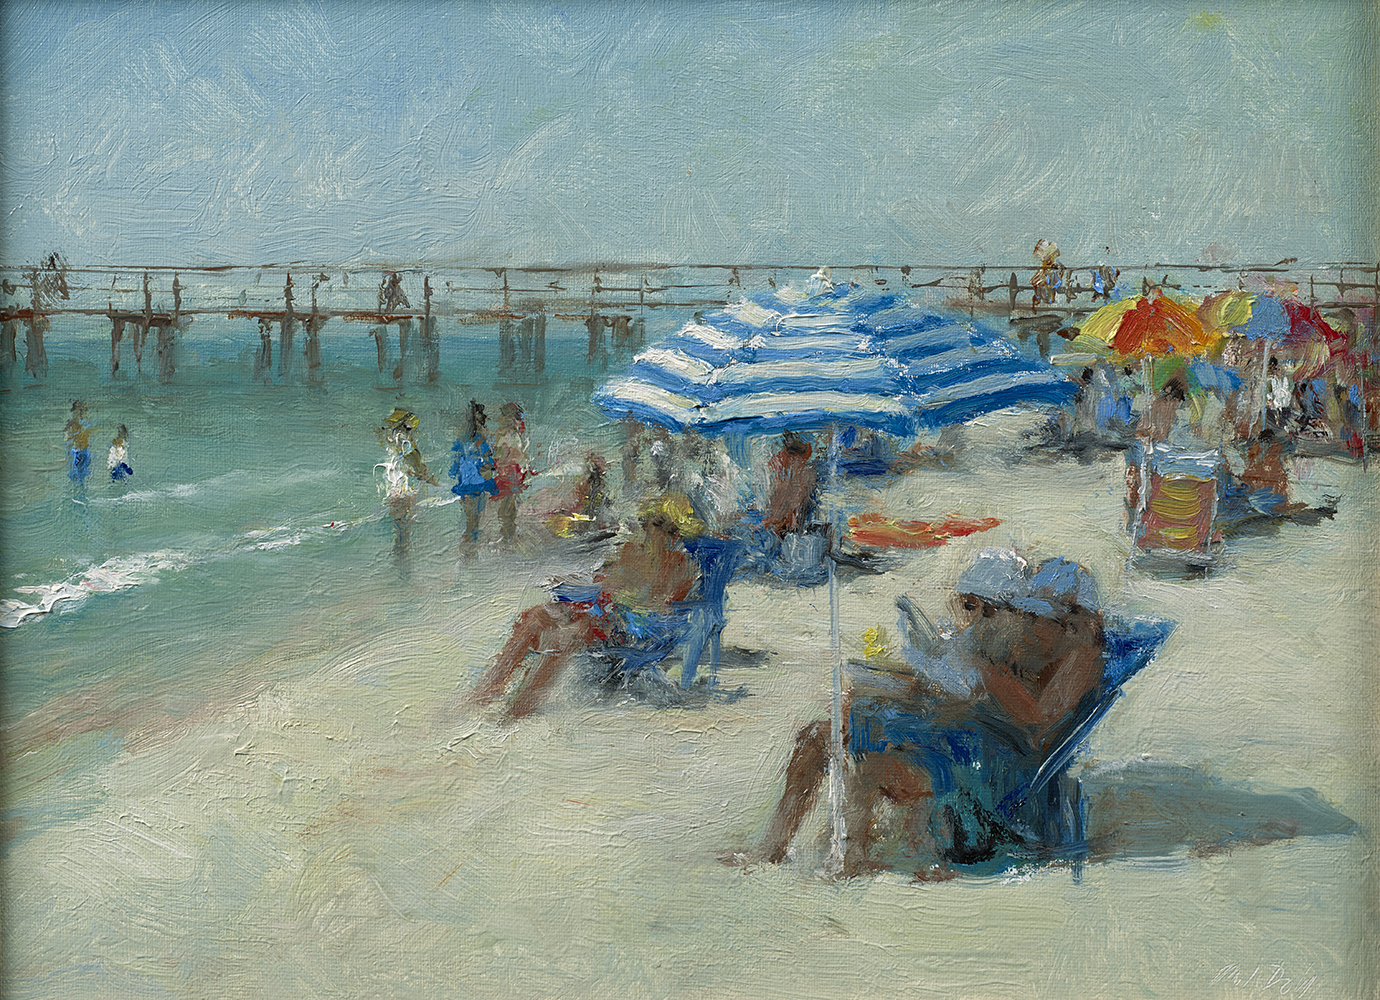 mark_daly_md1067_blue_striped_umbrella_naples_florida.jpg